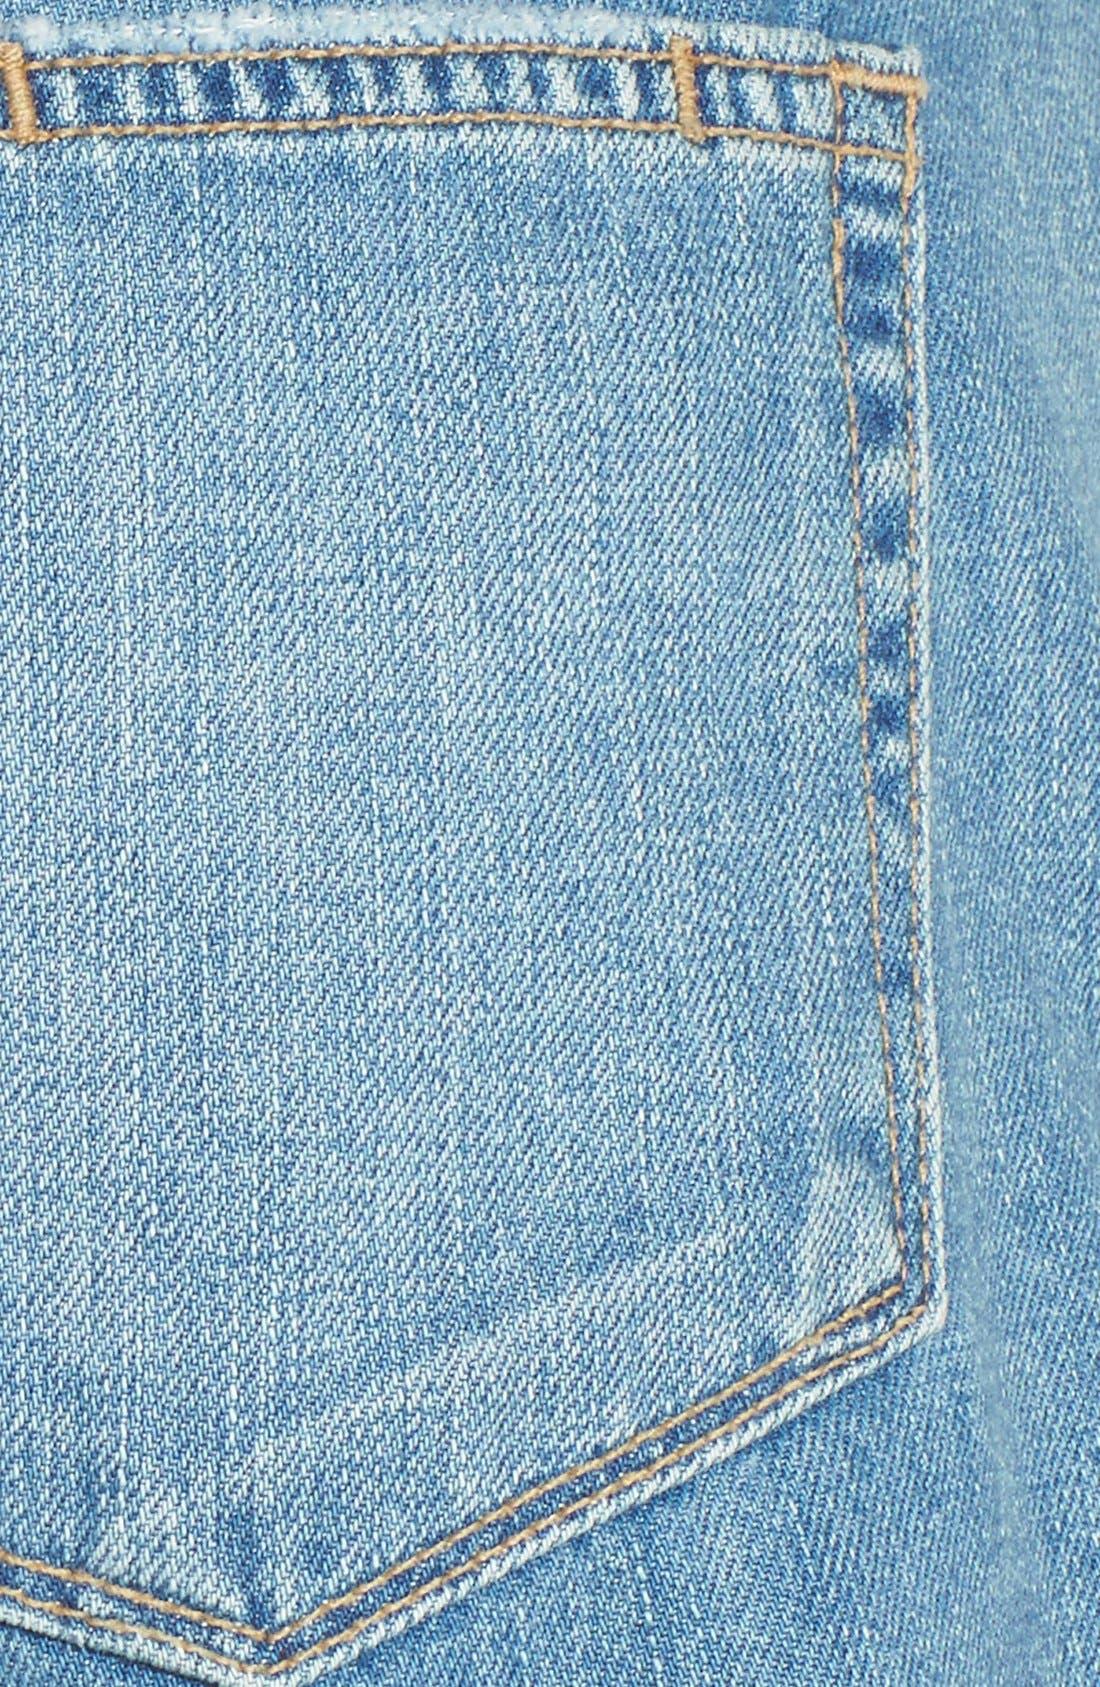 Alternate Image 5  - PAIGE 'Jimmy Jimmy' Denim Shorts (Annora)